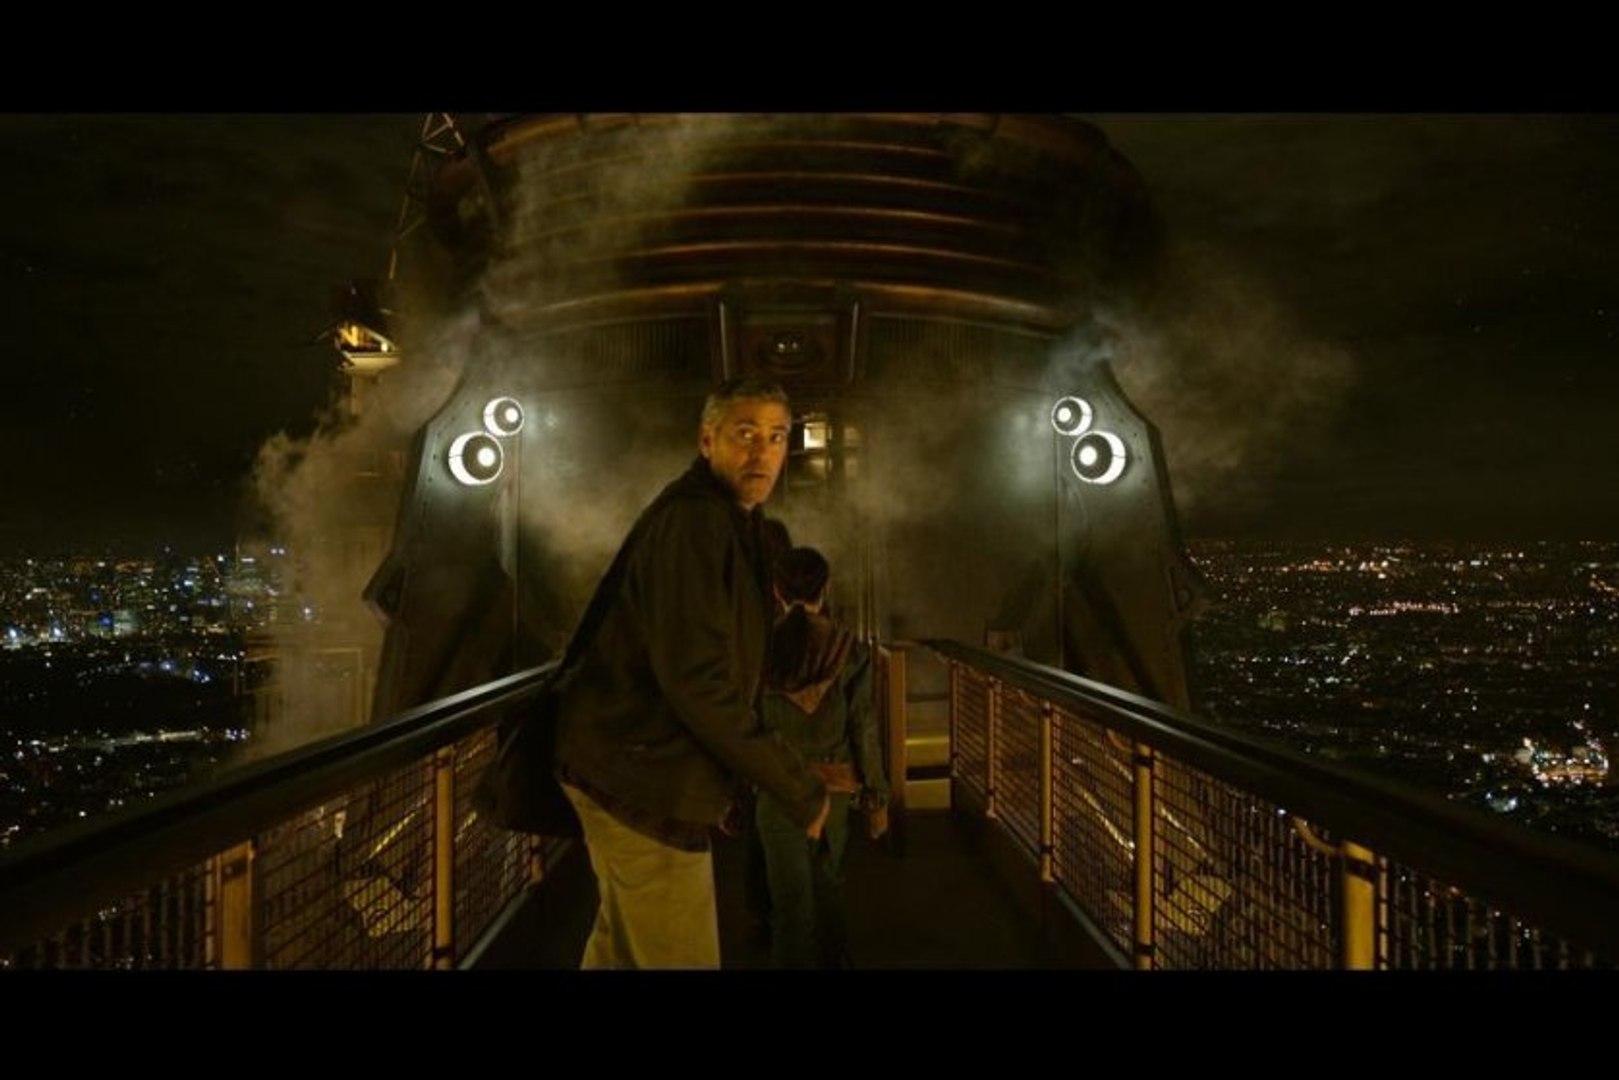 Tomorrowland full movie streaming [HD] 1080p